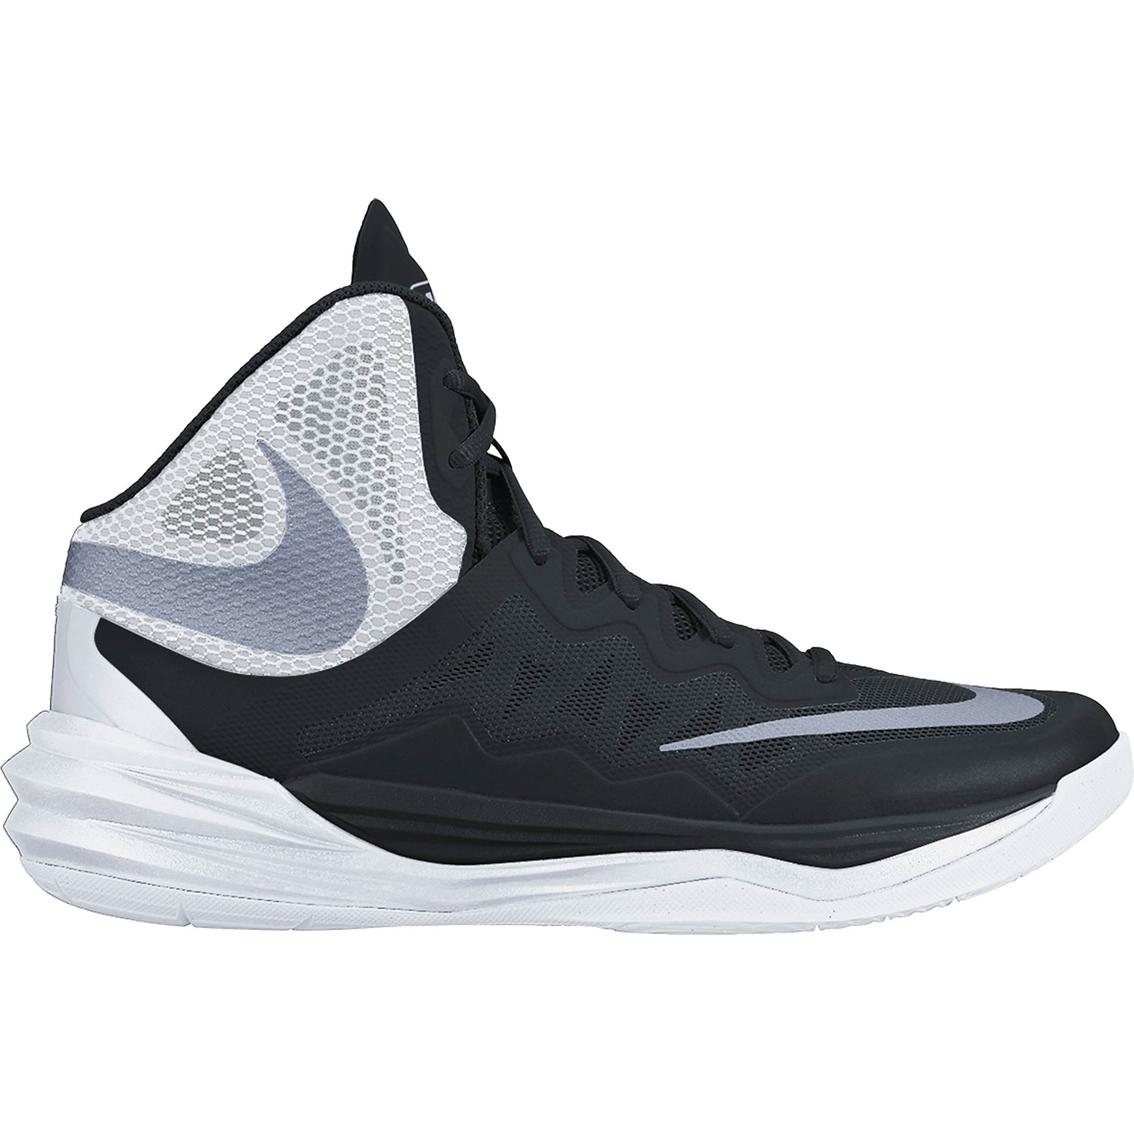 finest selection 67289 12e63 Nike Men s Prime Hype DF II Basketball Shoes